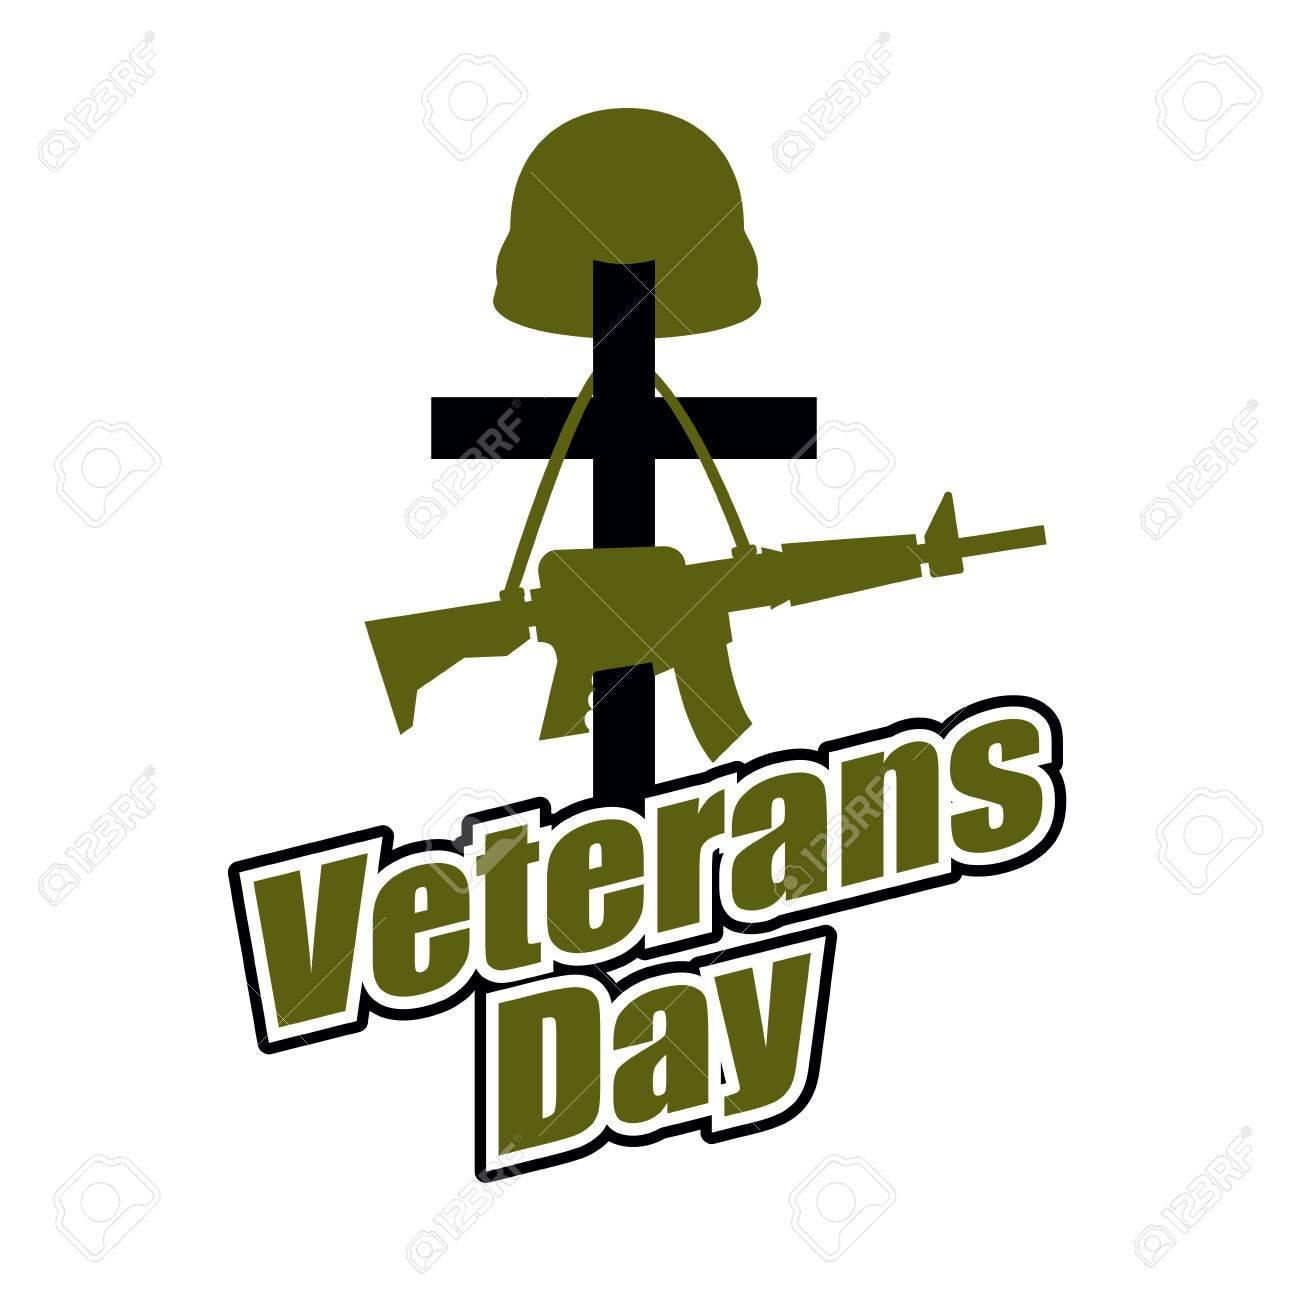 Cross and military helmet with gun veterans day logo for cross and military helmet with gun veterans day logo for national holiday in america biocorpaavc